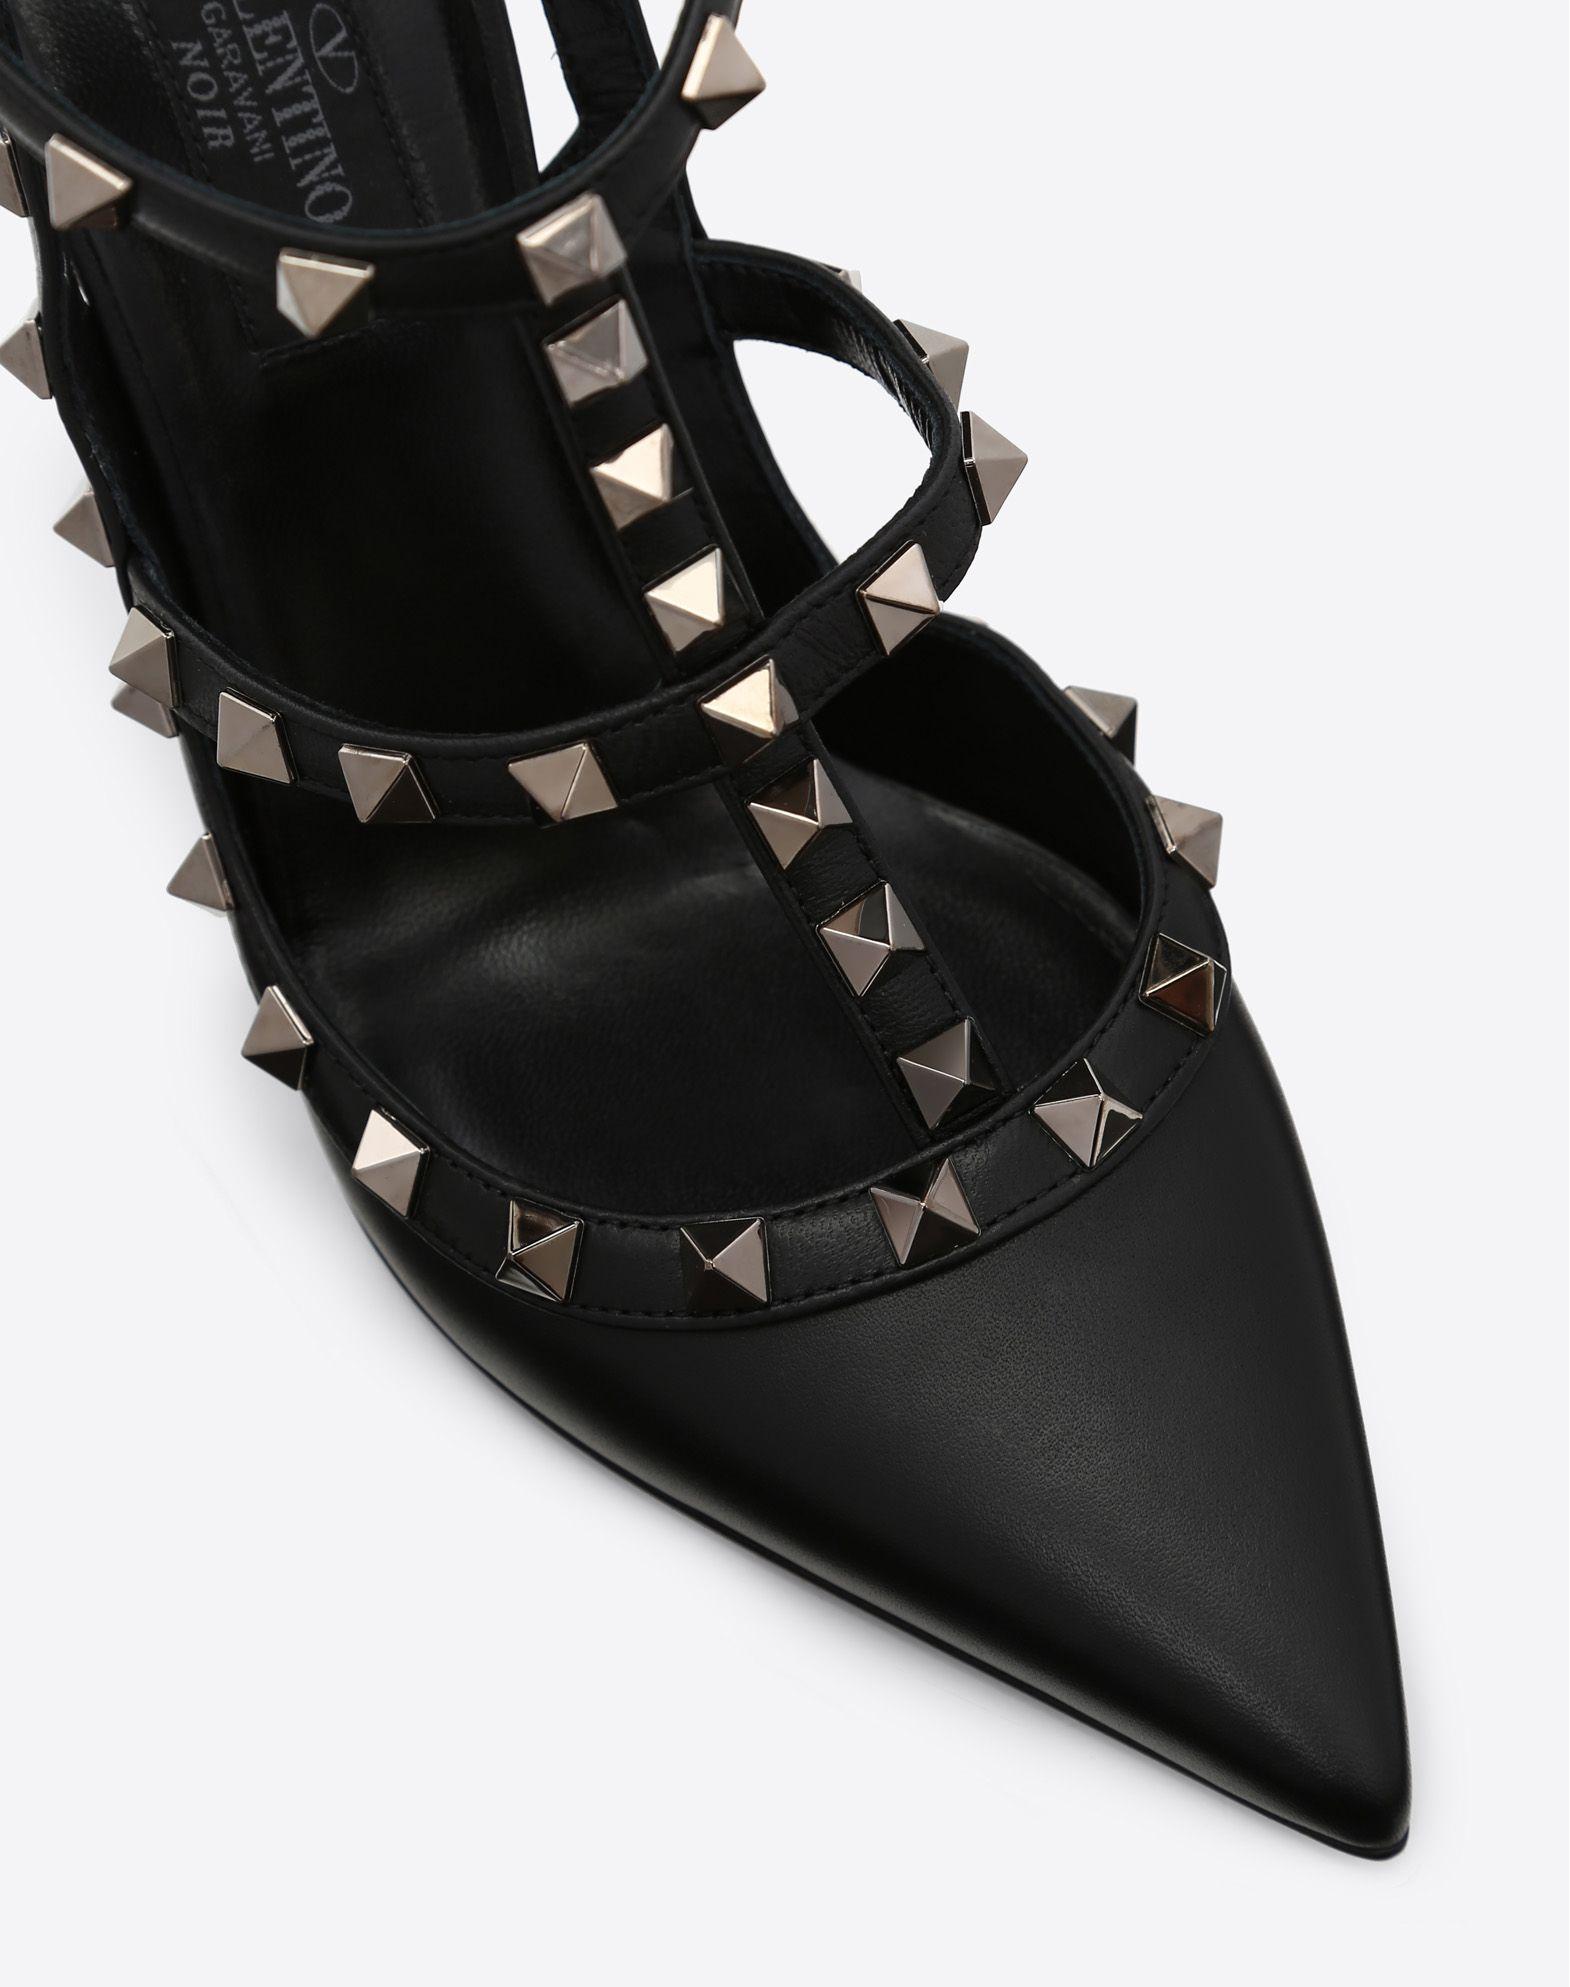 VALENTINO GARAVANI Rockstud Noir Ankle Strap Pump HIGH HEEL PUMPS D b